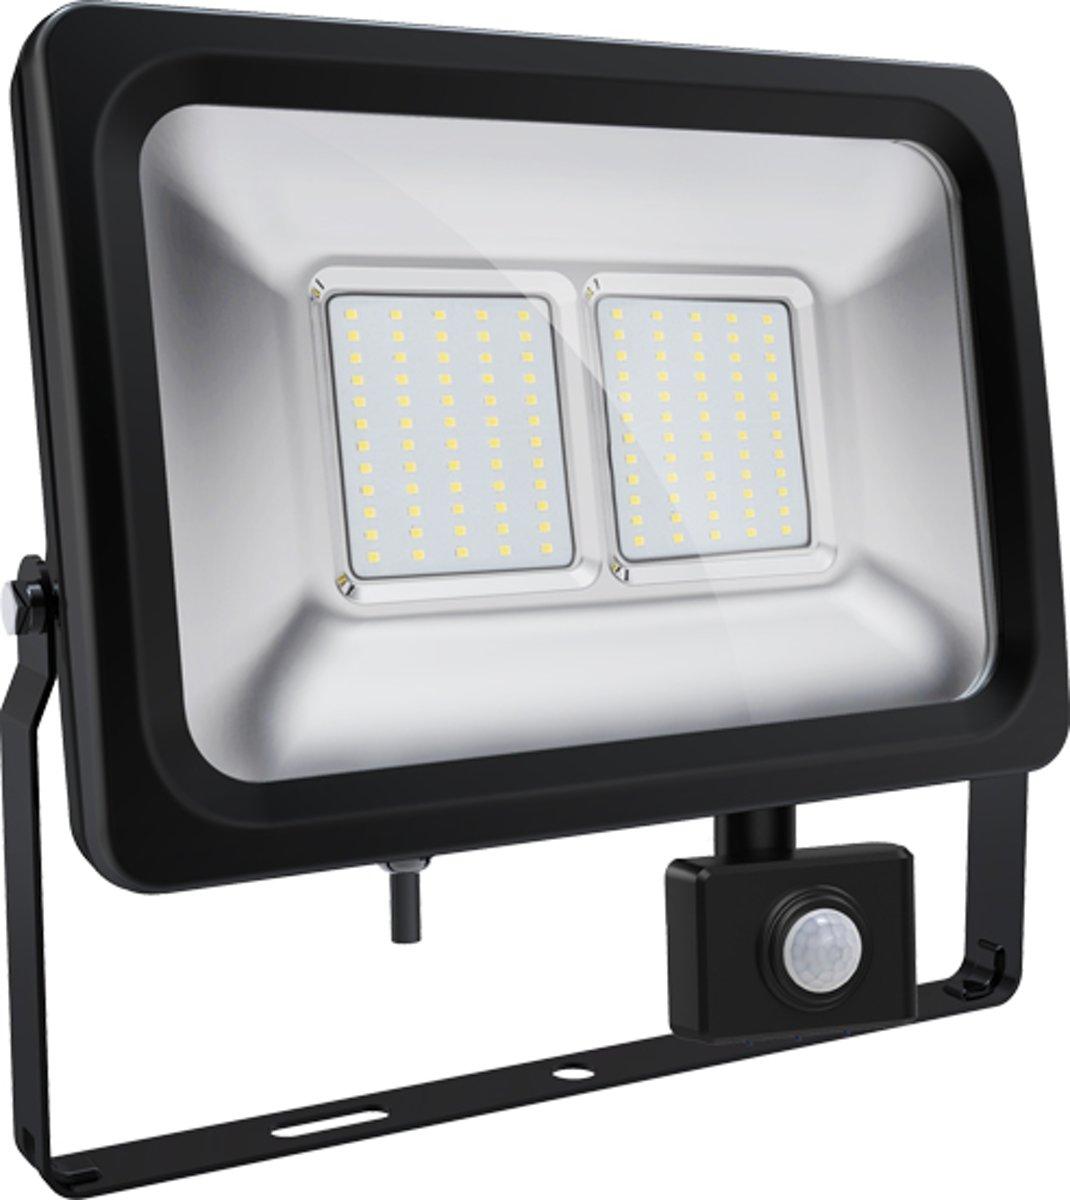 Sensor led bouwlamp 50 Watt warm wit licht kopen